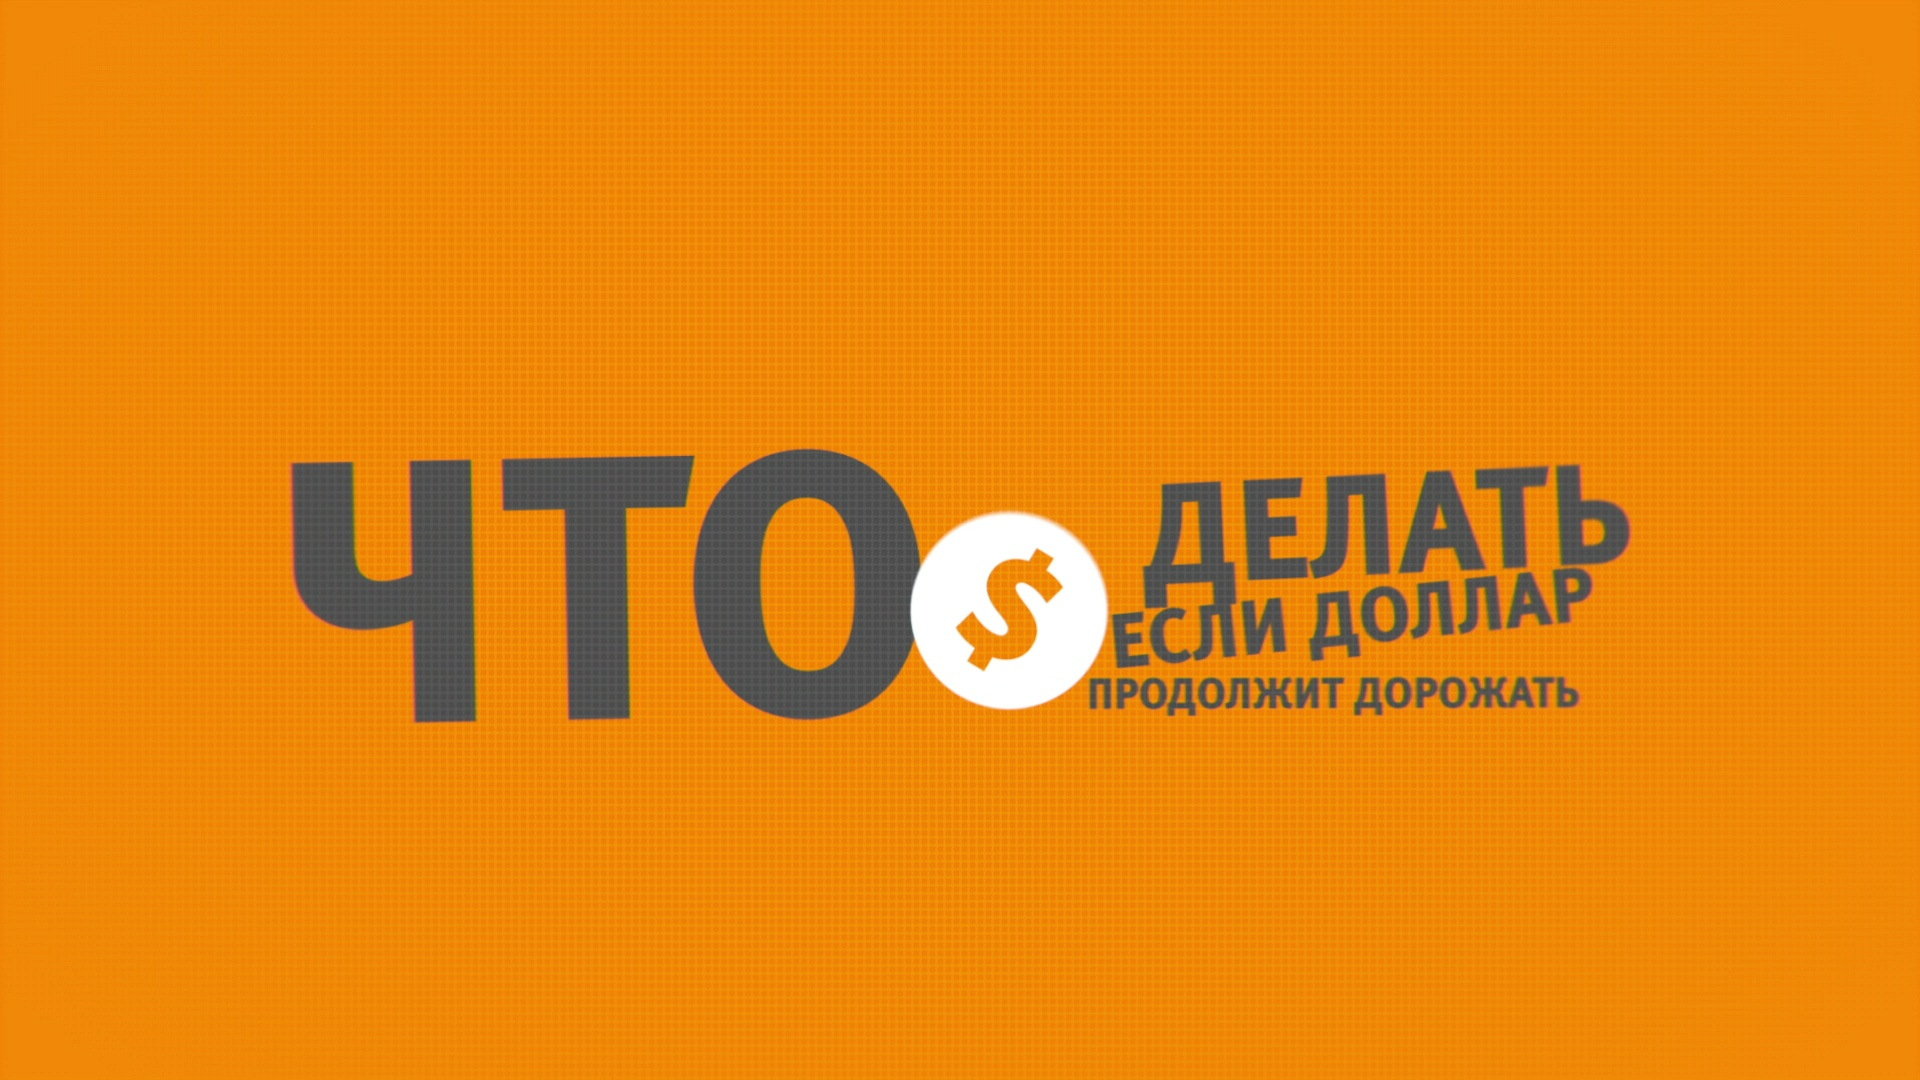 ams_2020-11-12-08h11m19s088